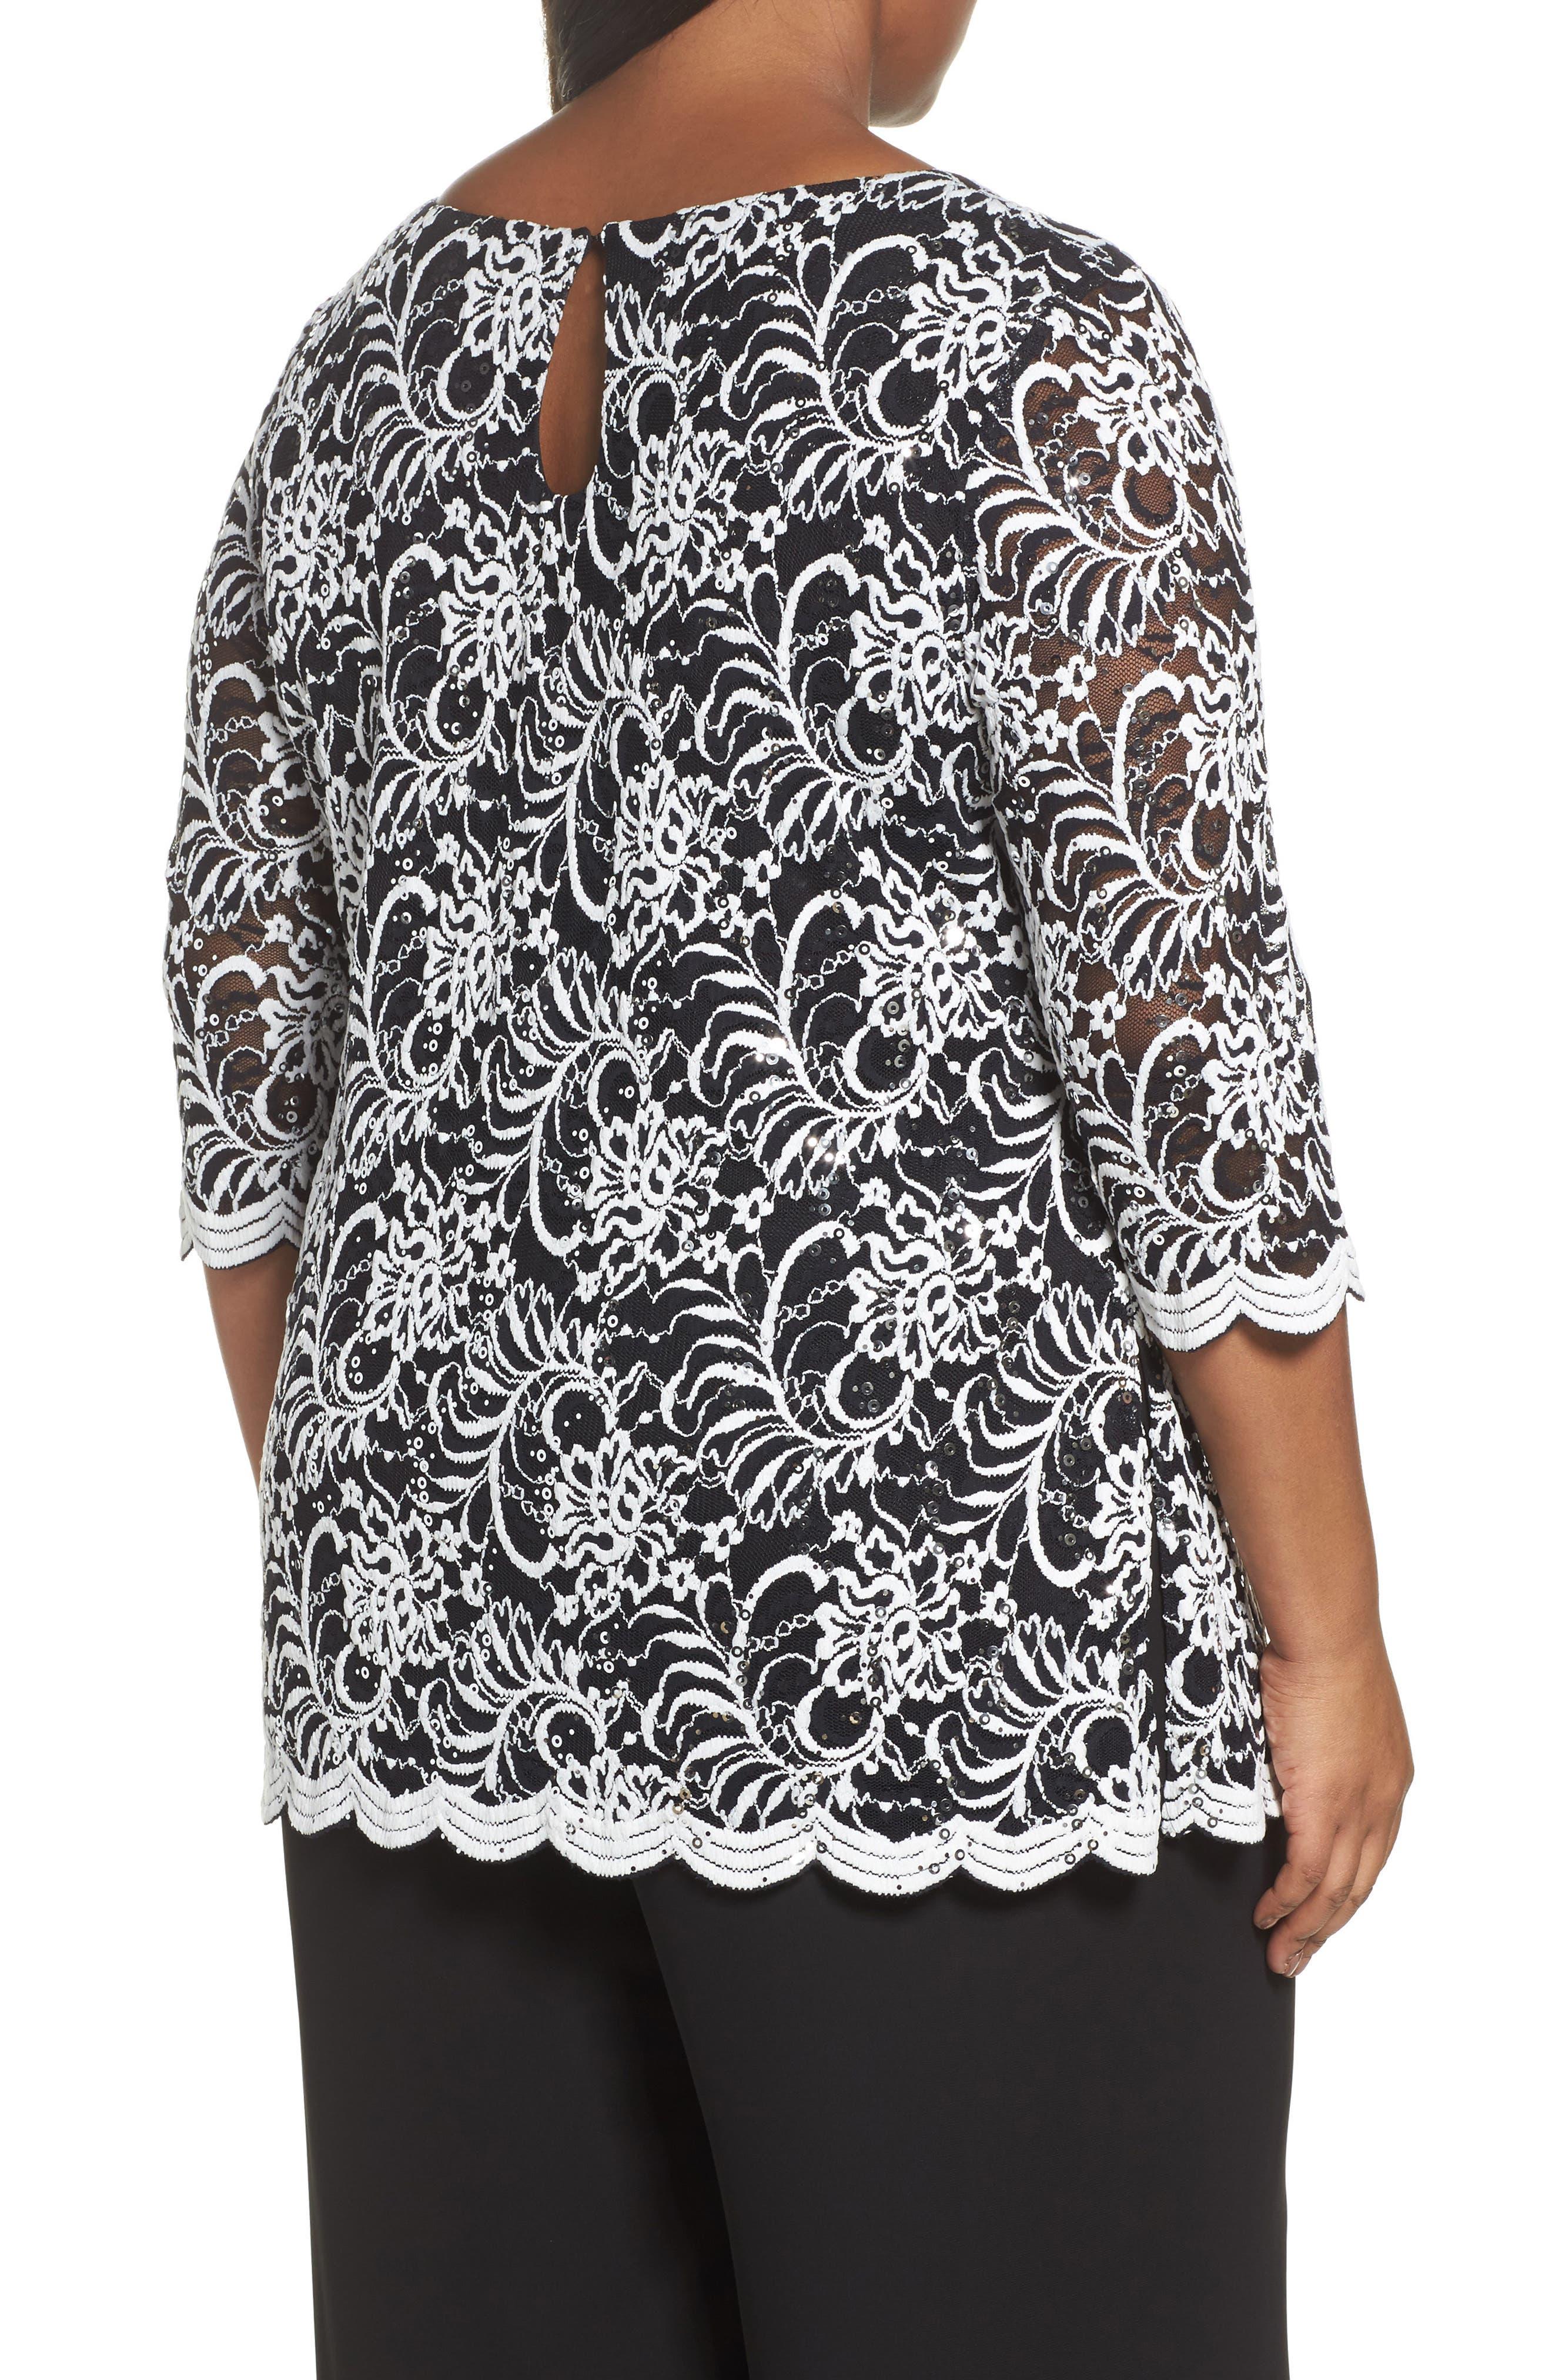 Embroidered Tulle Blouse,                             Alternate thumbnail 2, color,                             Black/ White